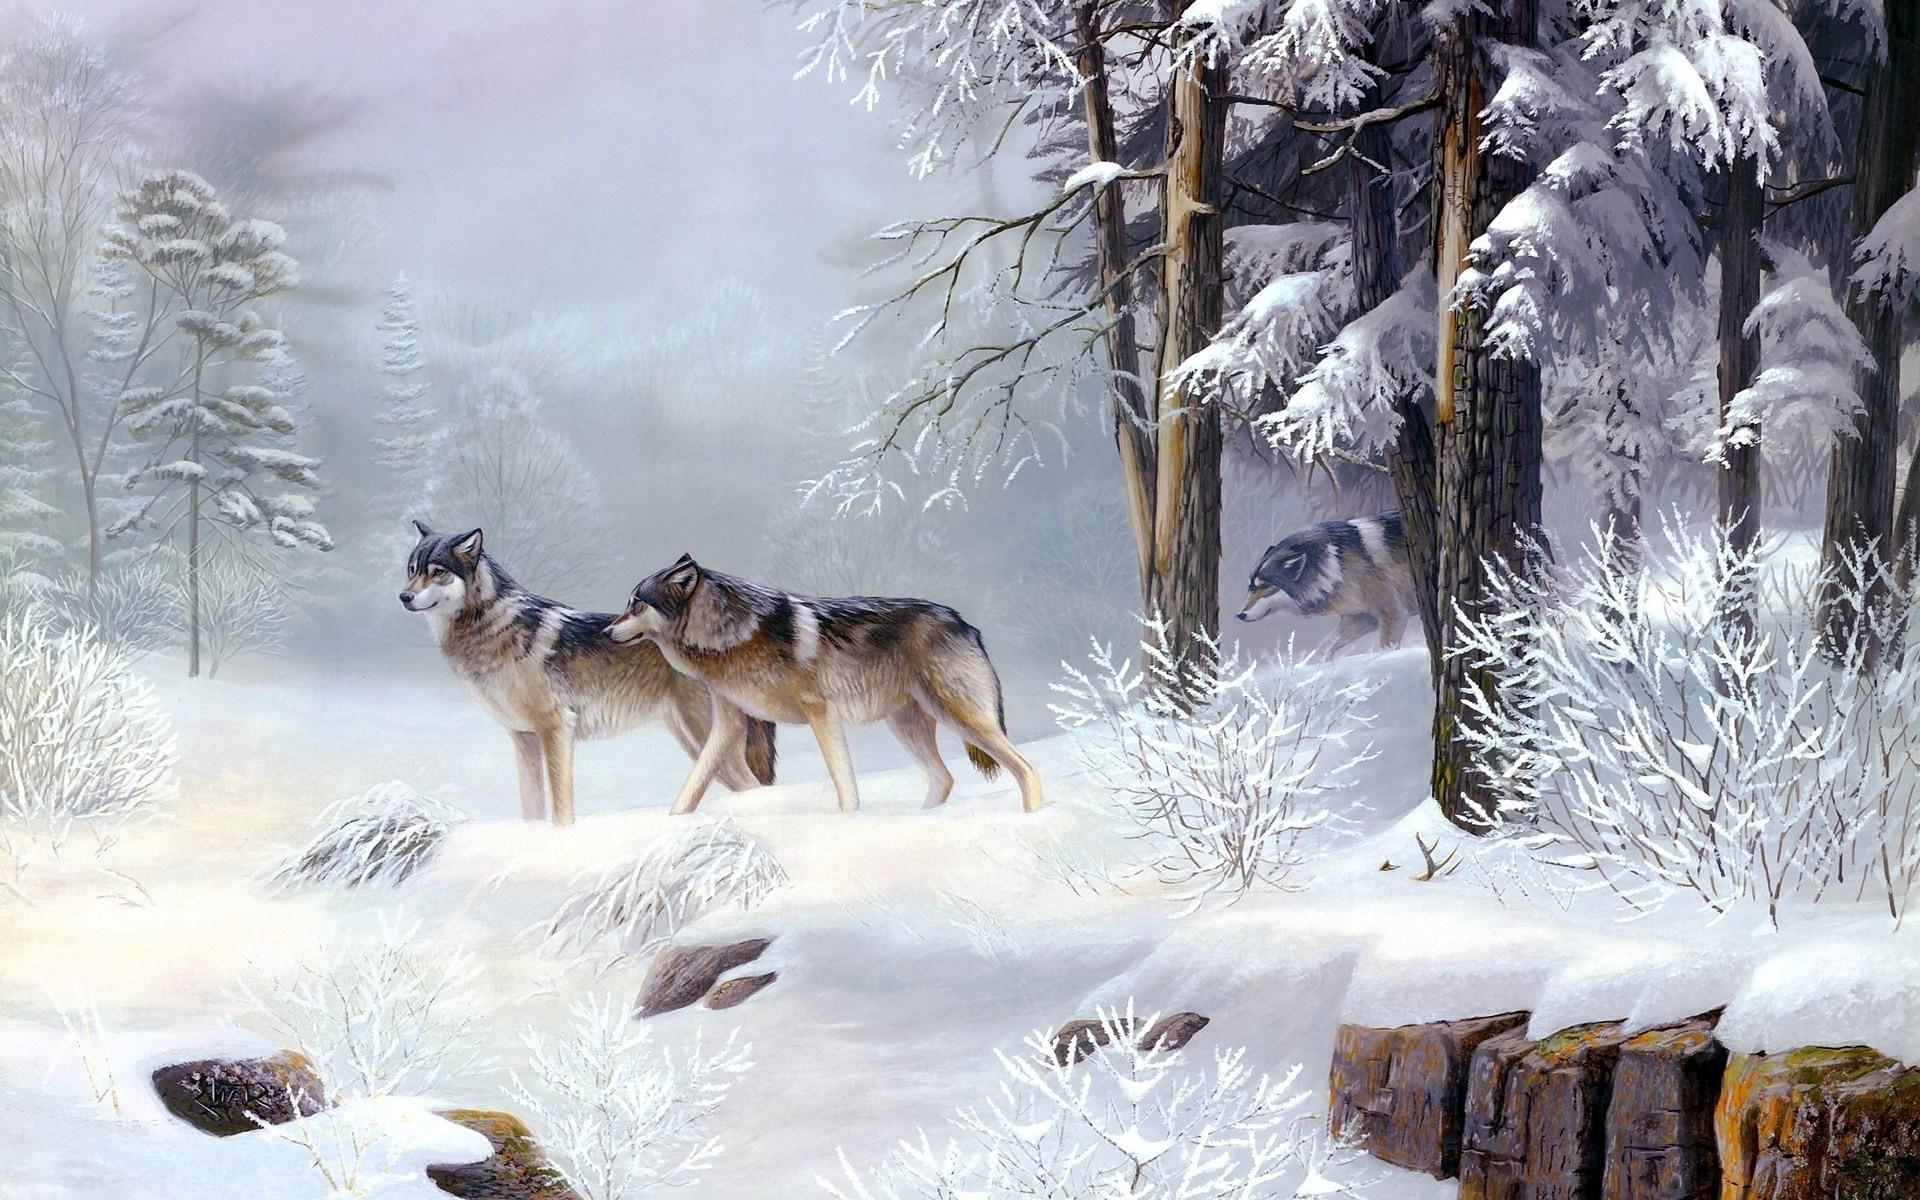 Wolves in the forest Digital Art HD desktop wallpaper, Tree wallpaper, Snow  wallpaper, Forest wallpaper, Wolf wallpaper – Digital Art no.